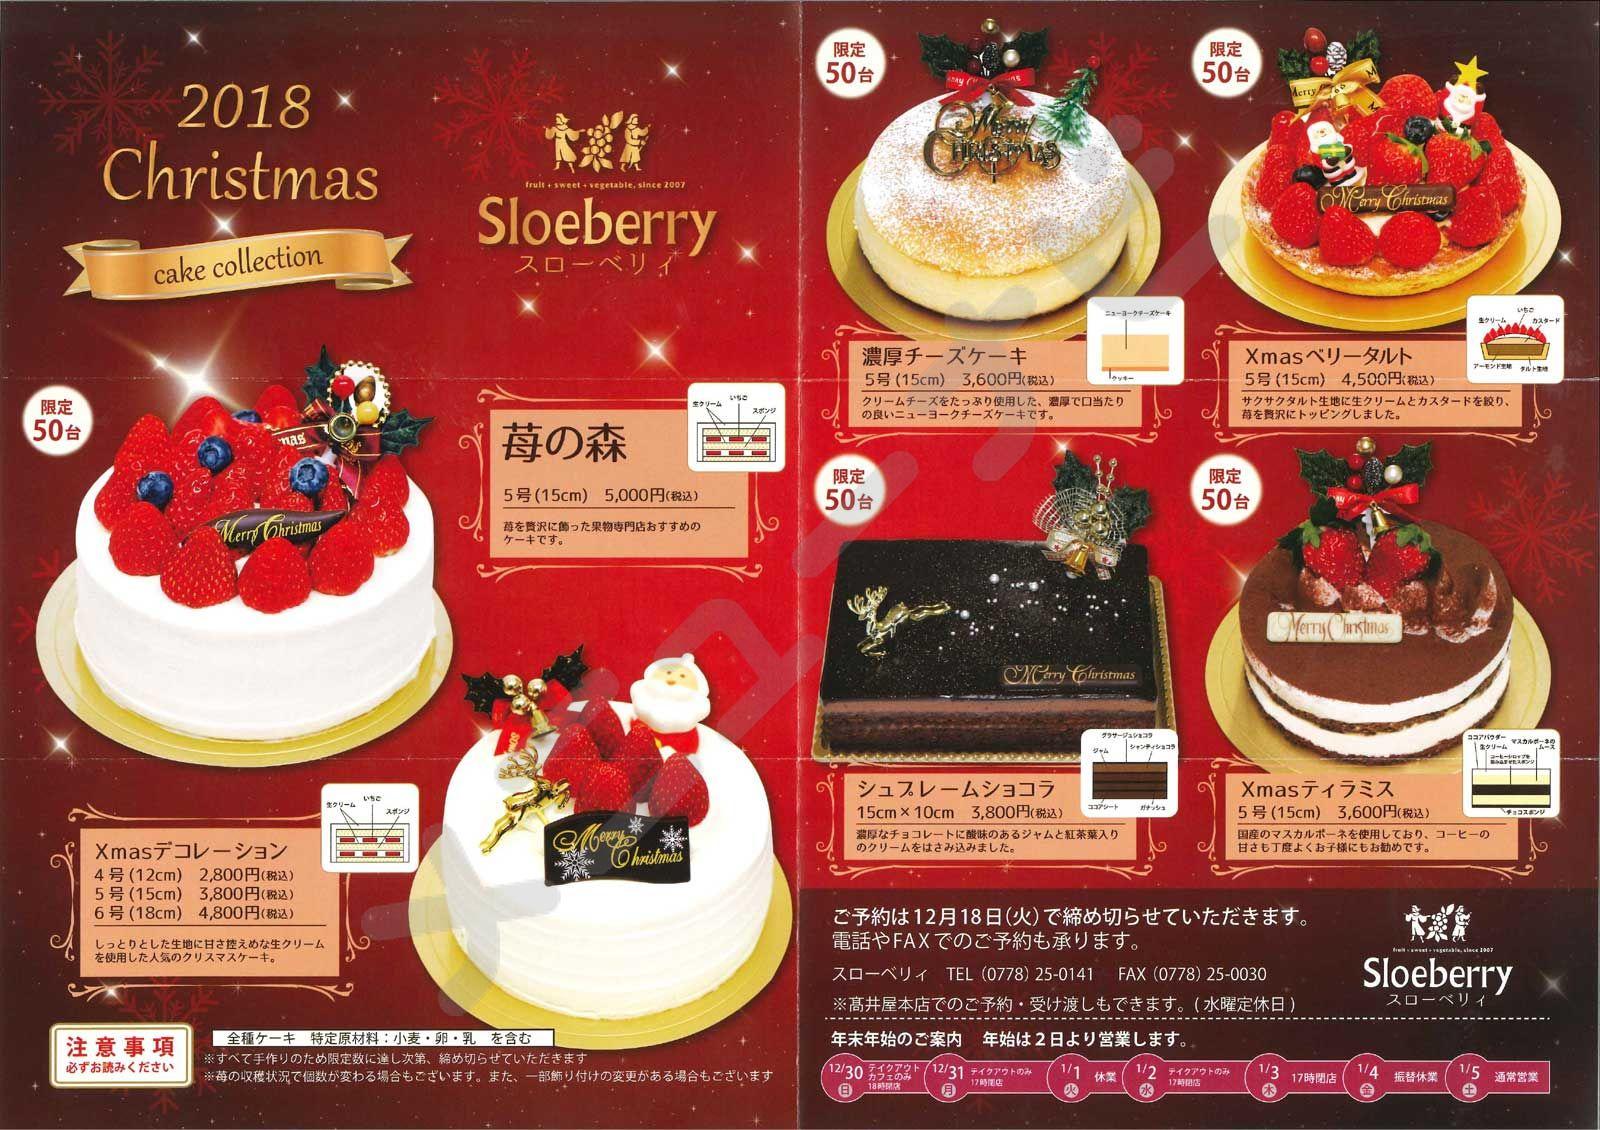 Sloeberryクリスマスケーキ